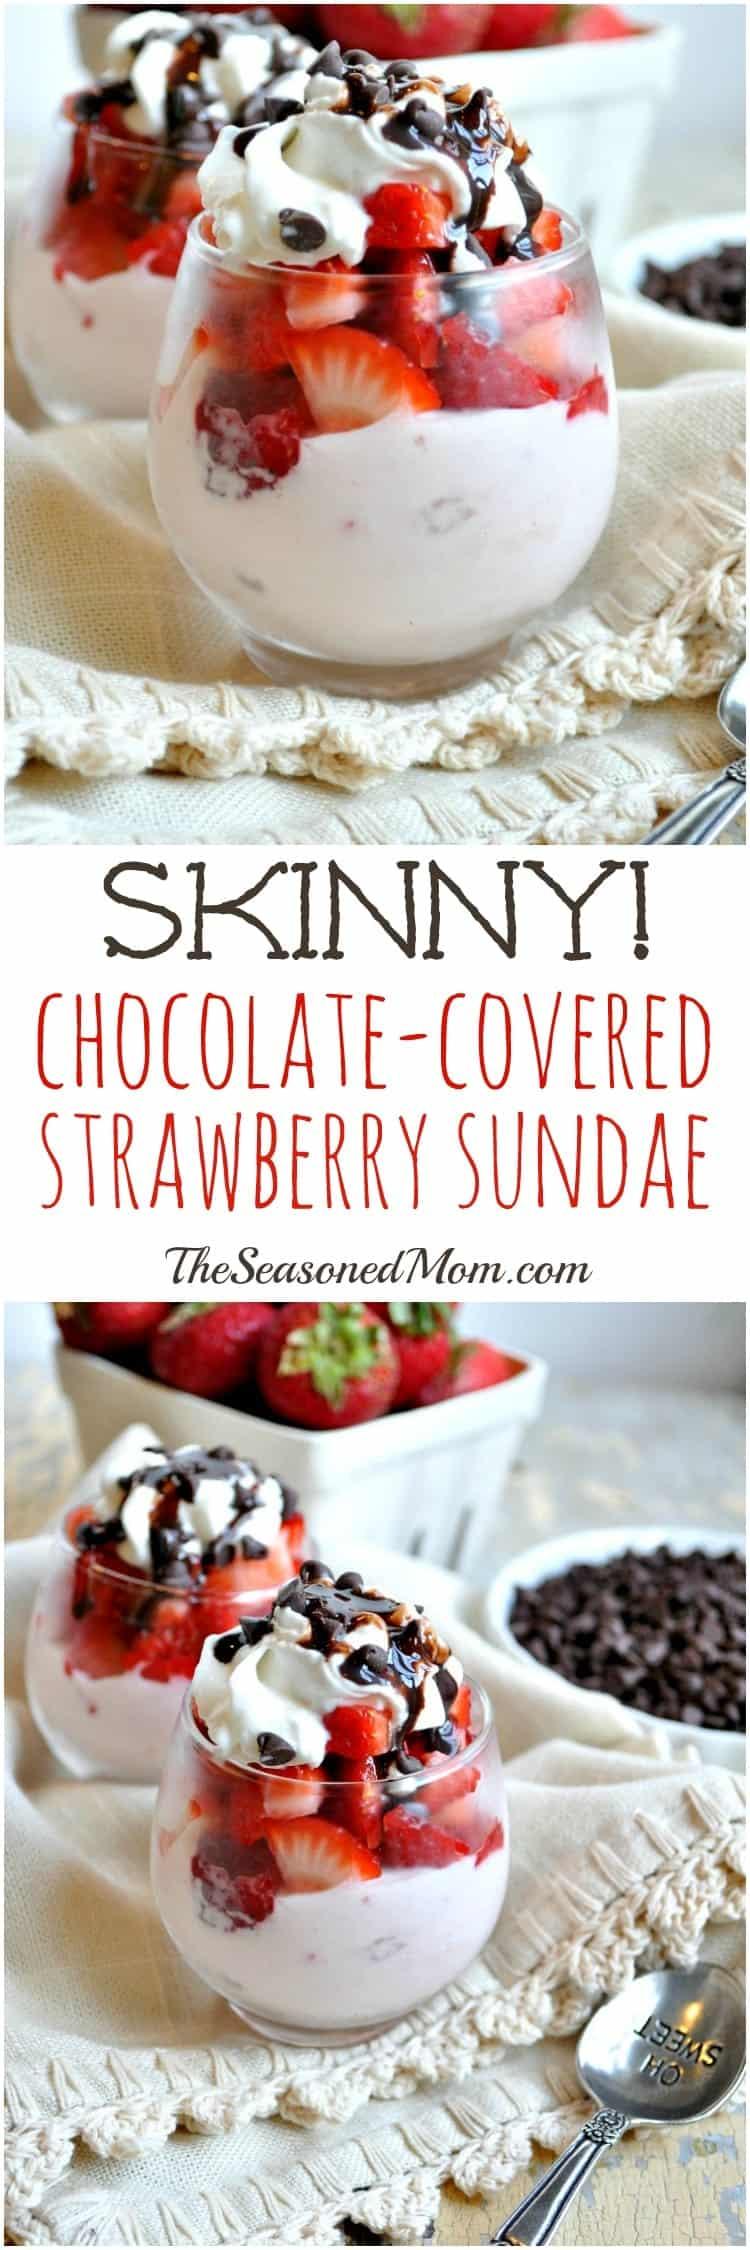 Skinny Chocolate Covered Strawberry Sundae